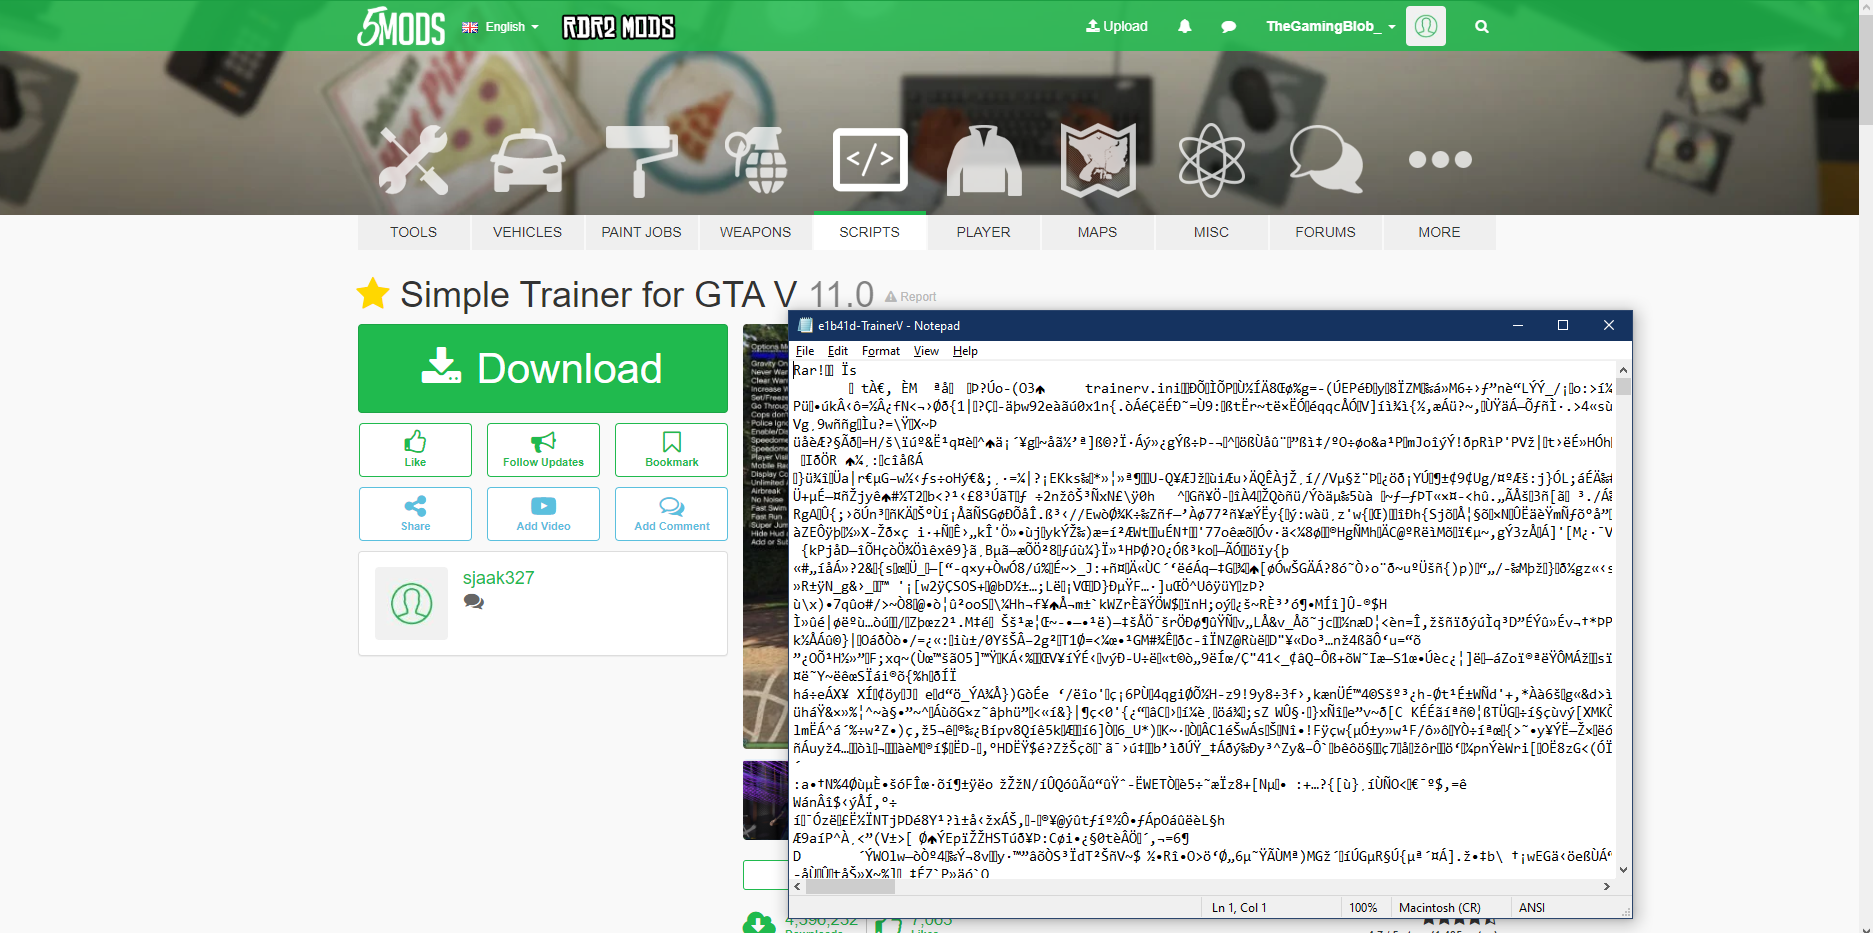 0_1589271531343_Desktop Screenshot 2020.05.12 - 13.17.02.89.png